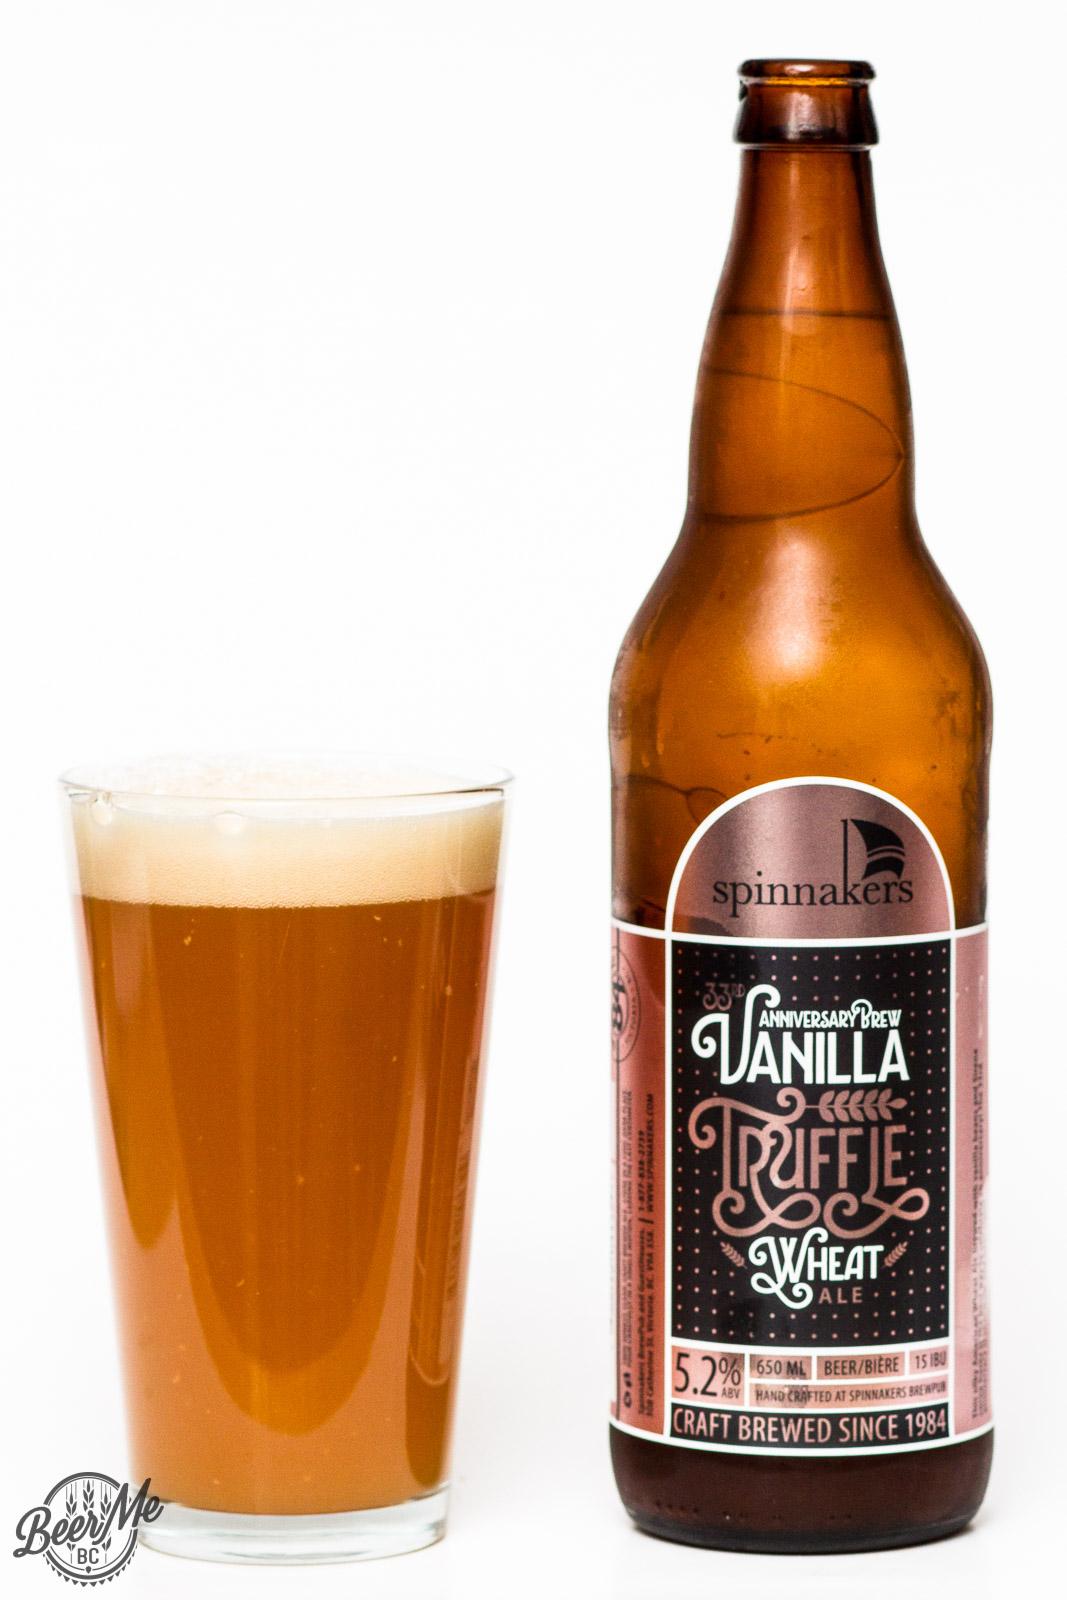 Spinnaker's Brewery – 33rd Anniversary Vannilla Truffle ...